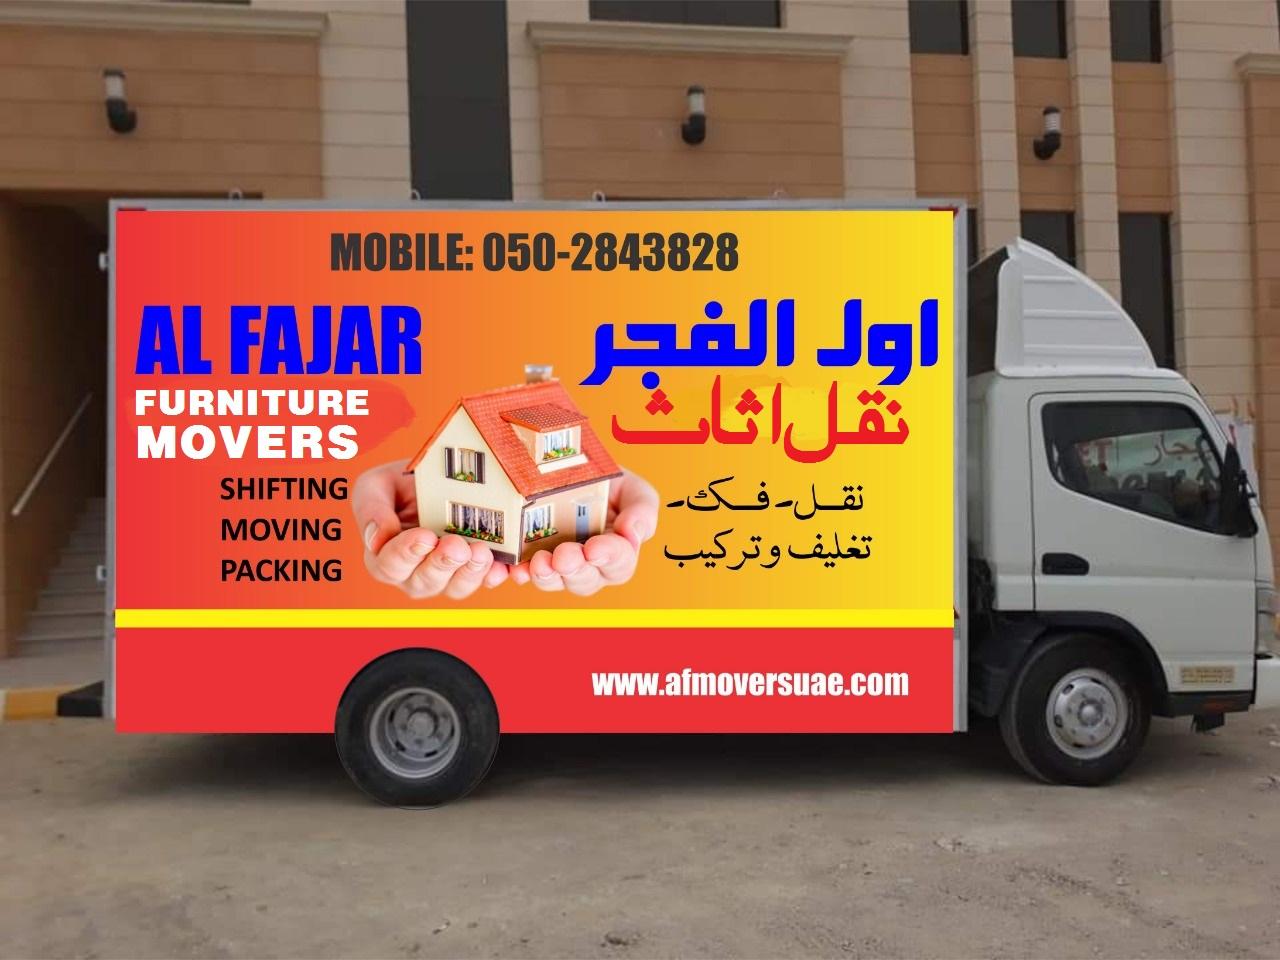 AWAL FAJAR MOVERS